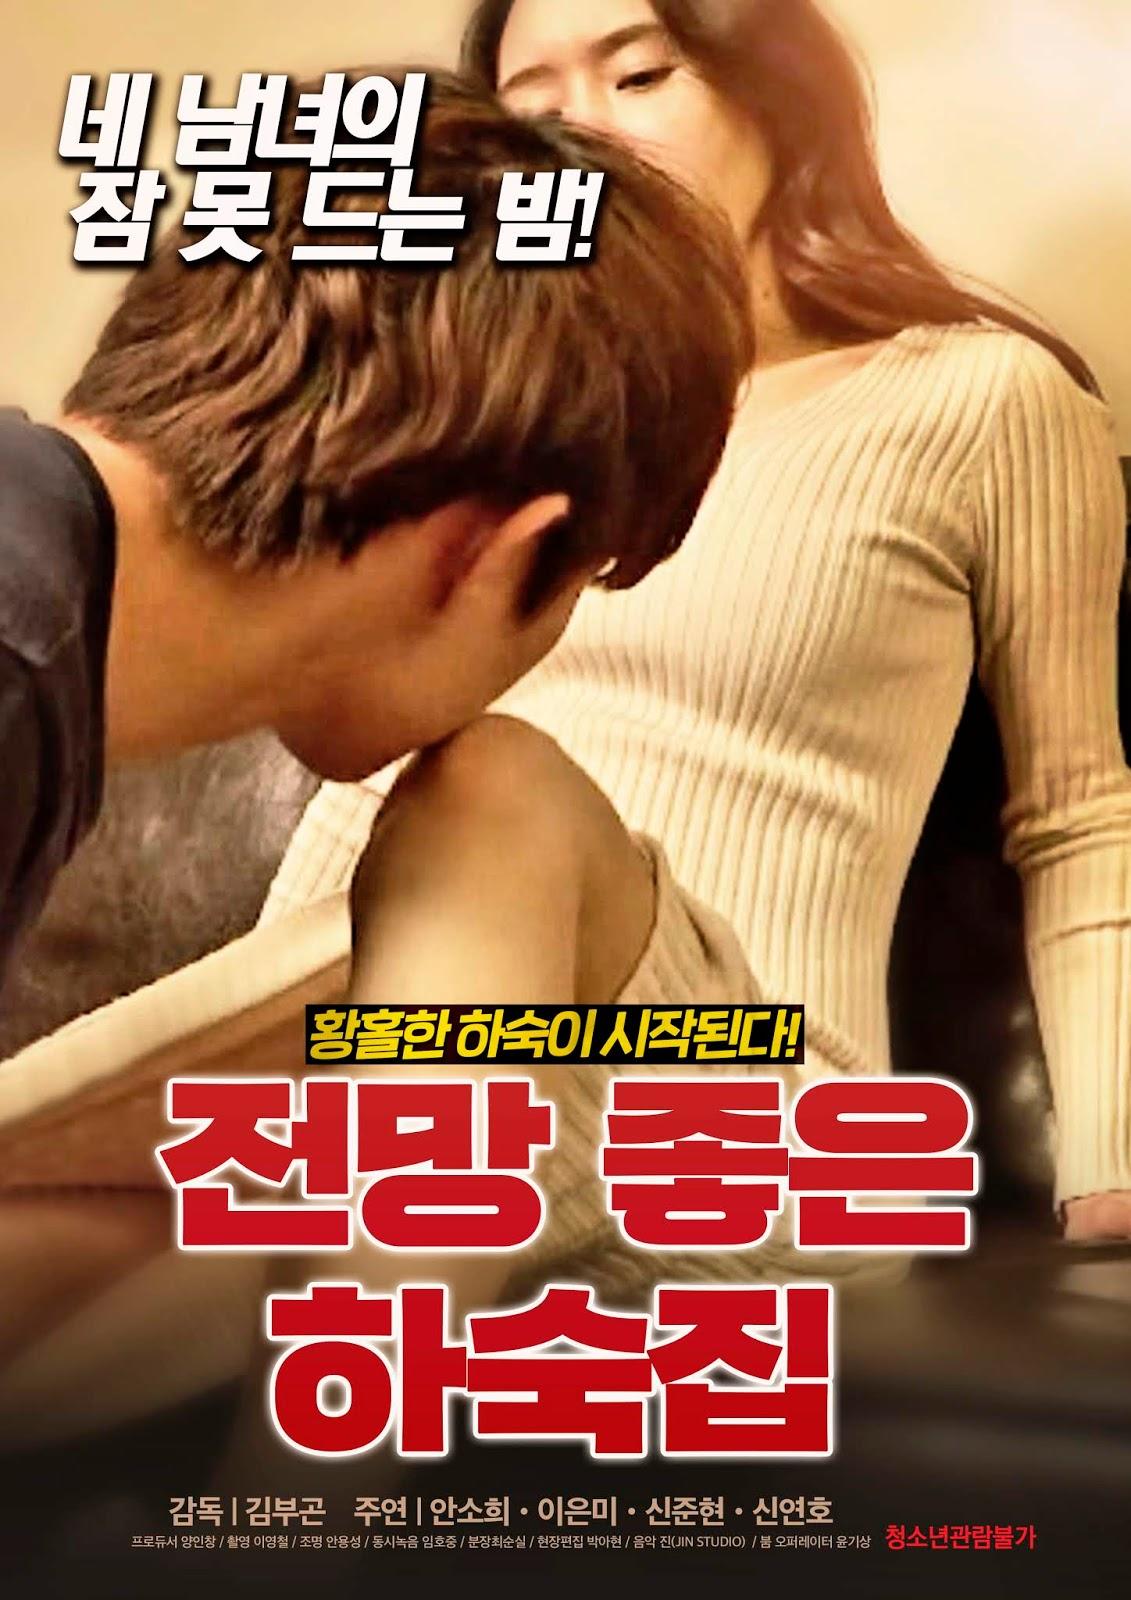 A Prospective Hostel Full Korea 18+ Adult Movie Online Free